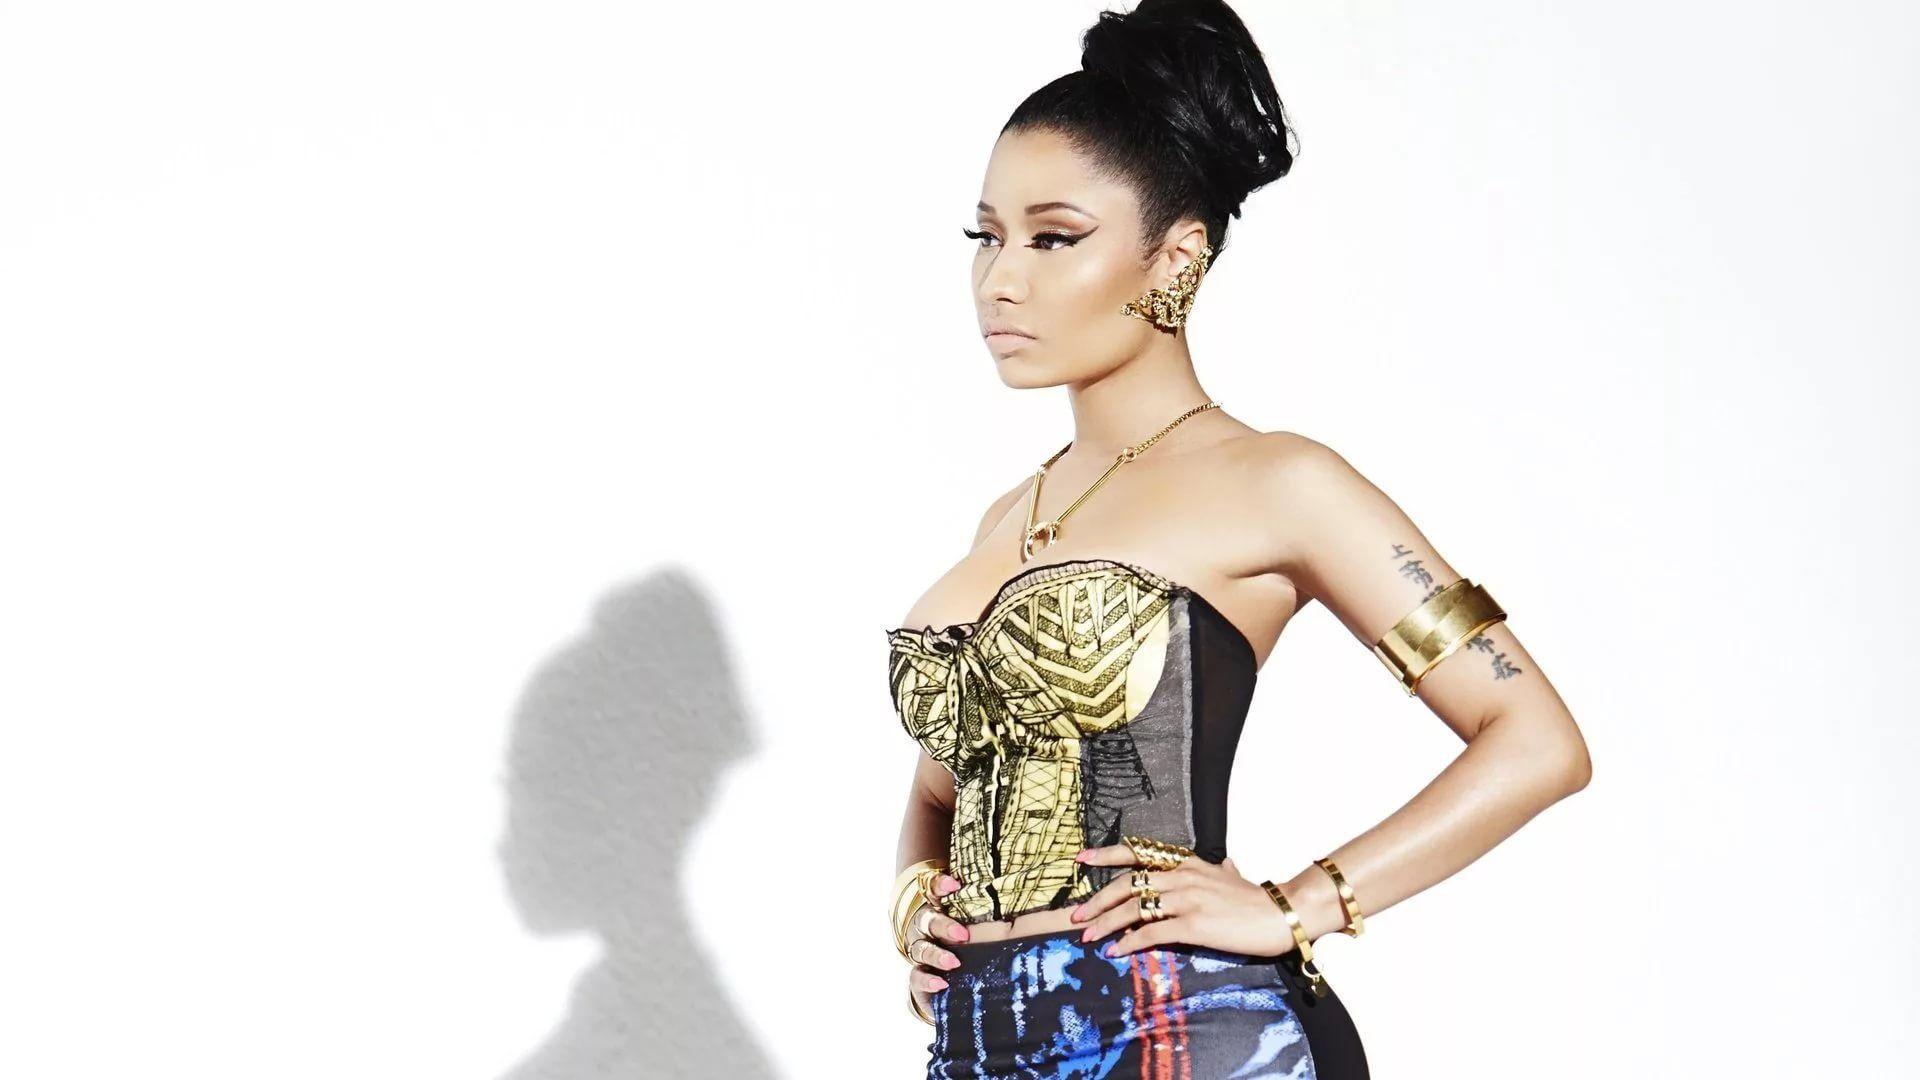 Nicki Minaj wallpaper photo full hd